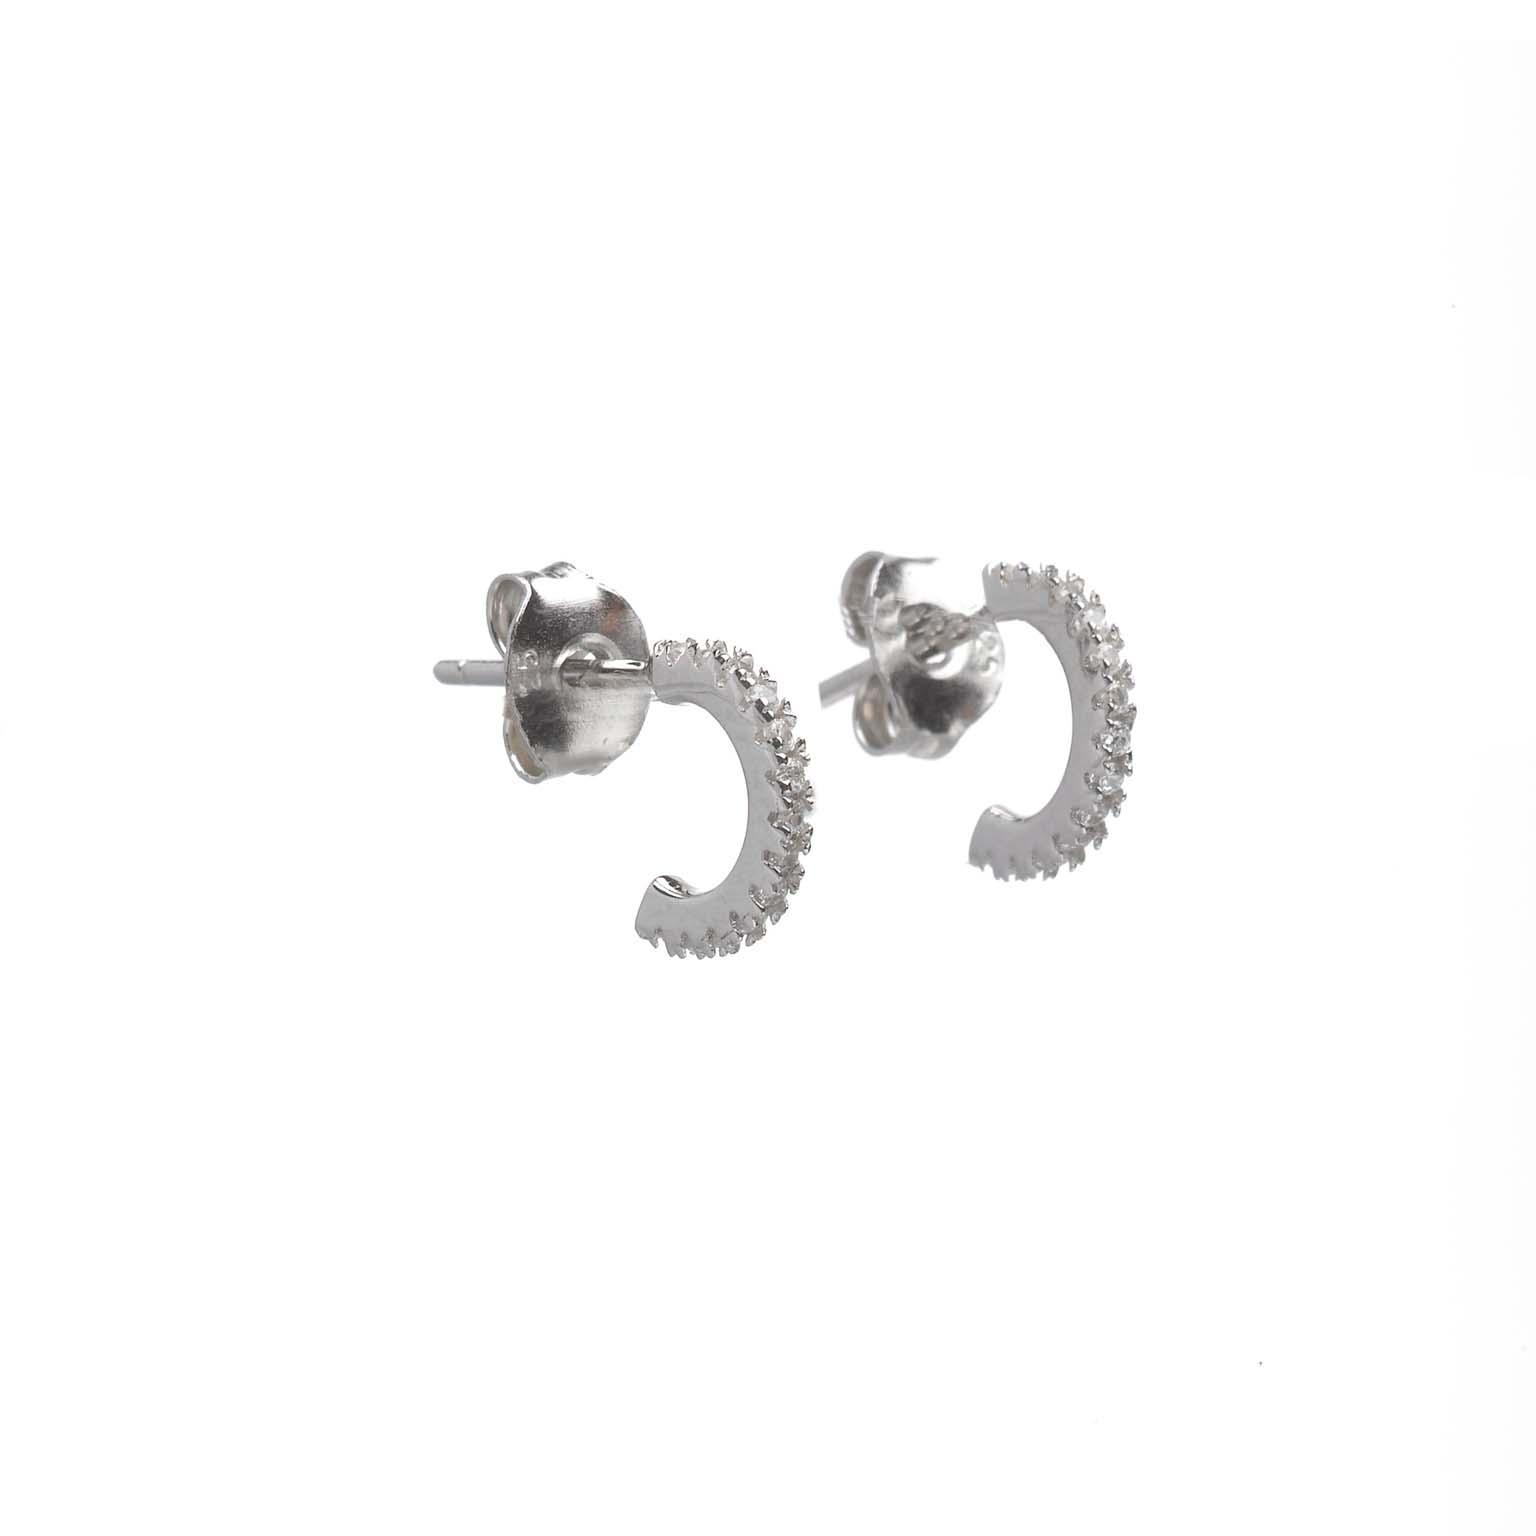 Salvatore pendientes plata rodio aro circonitas blancas 0.5cm